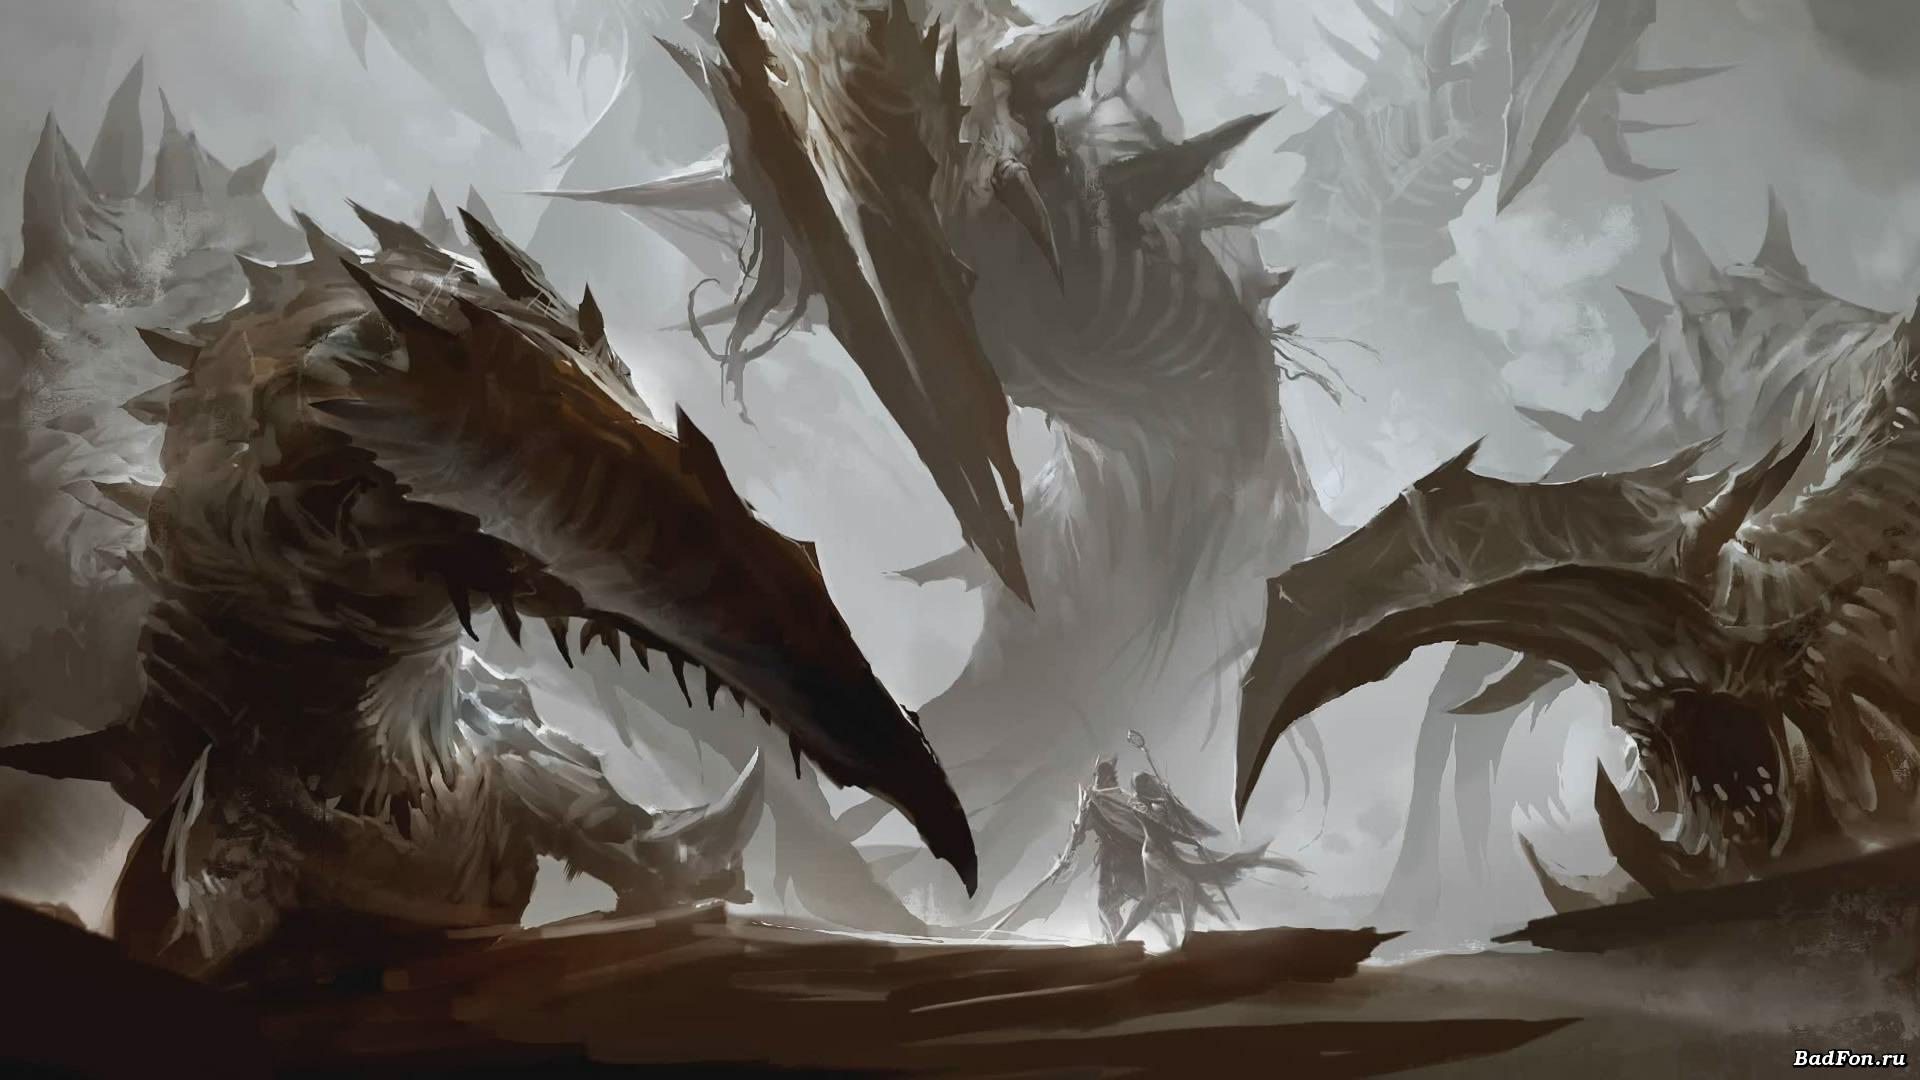 Image Guild Wars 2 Monster Mage Jpg Dragon S Dogma